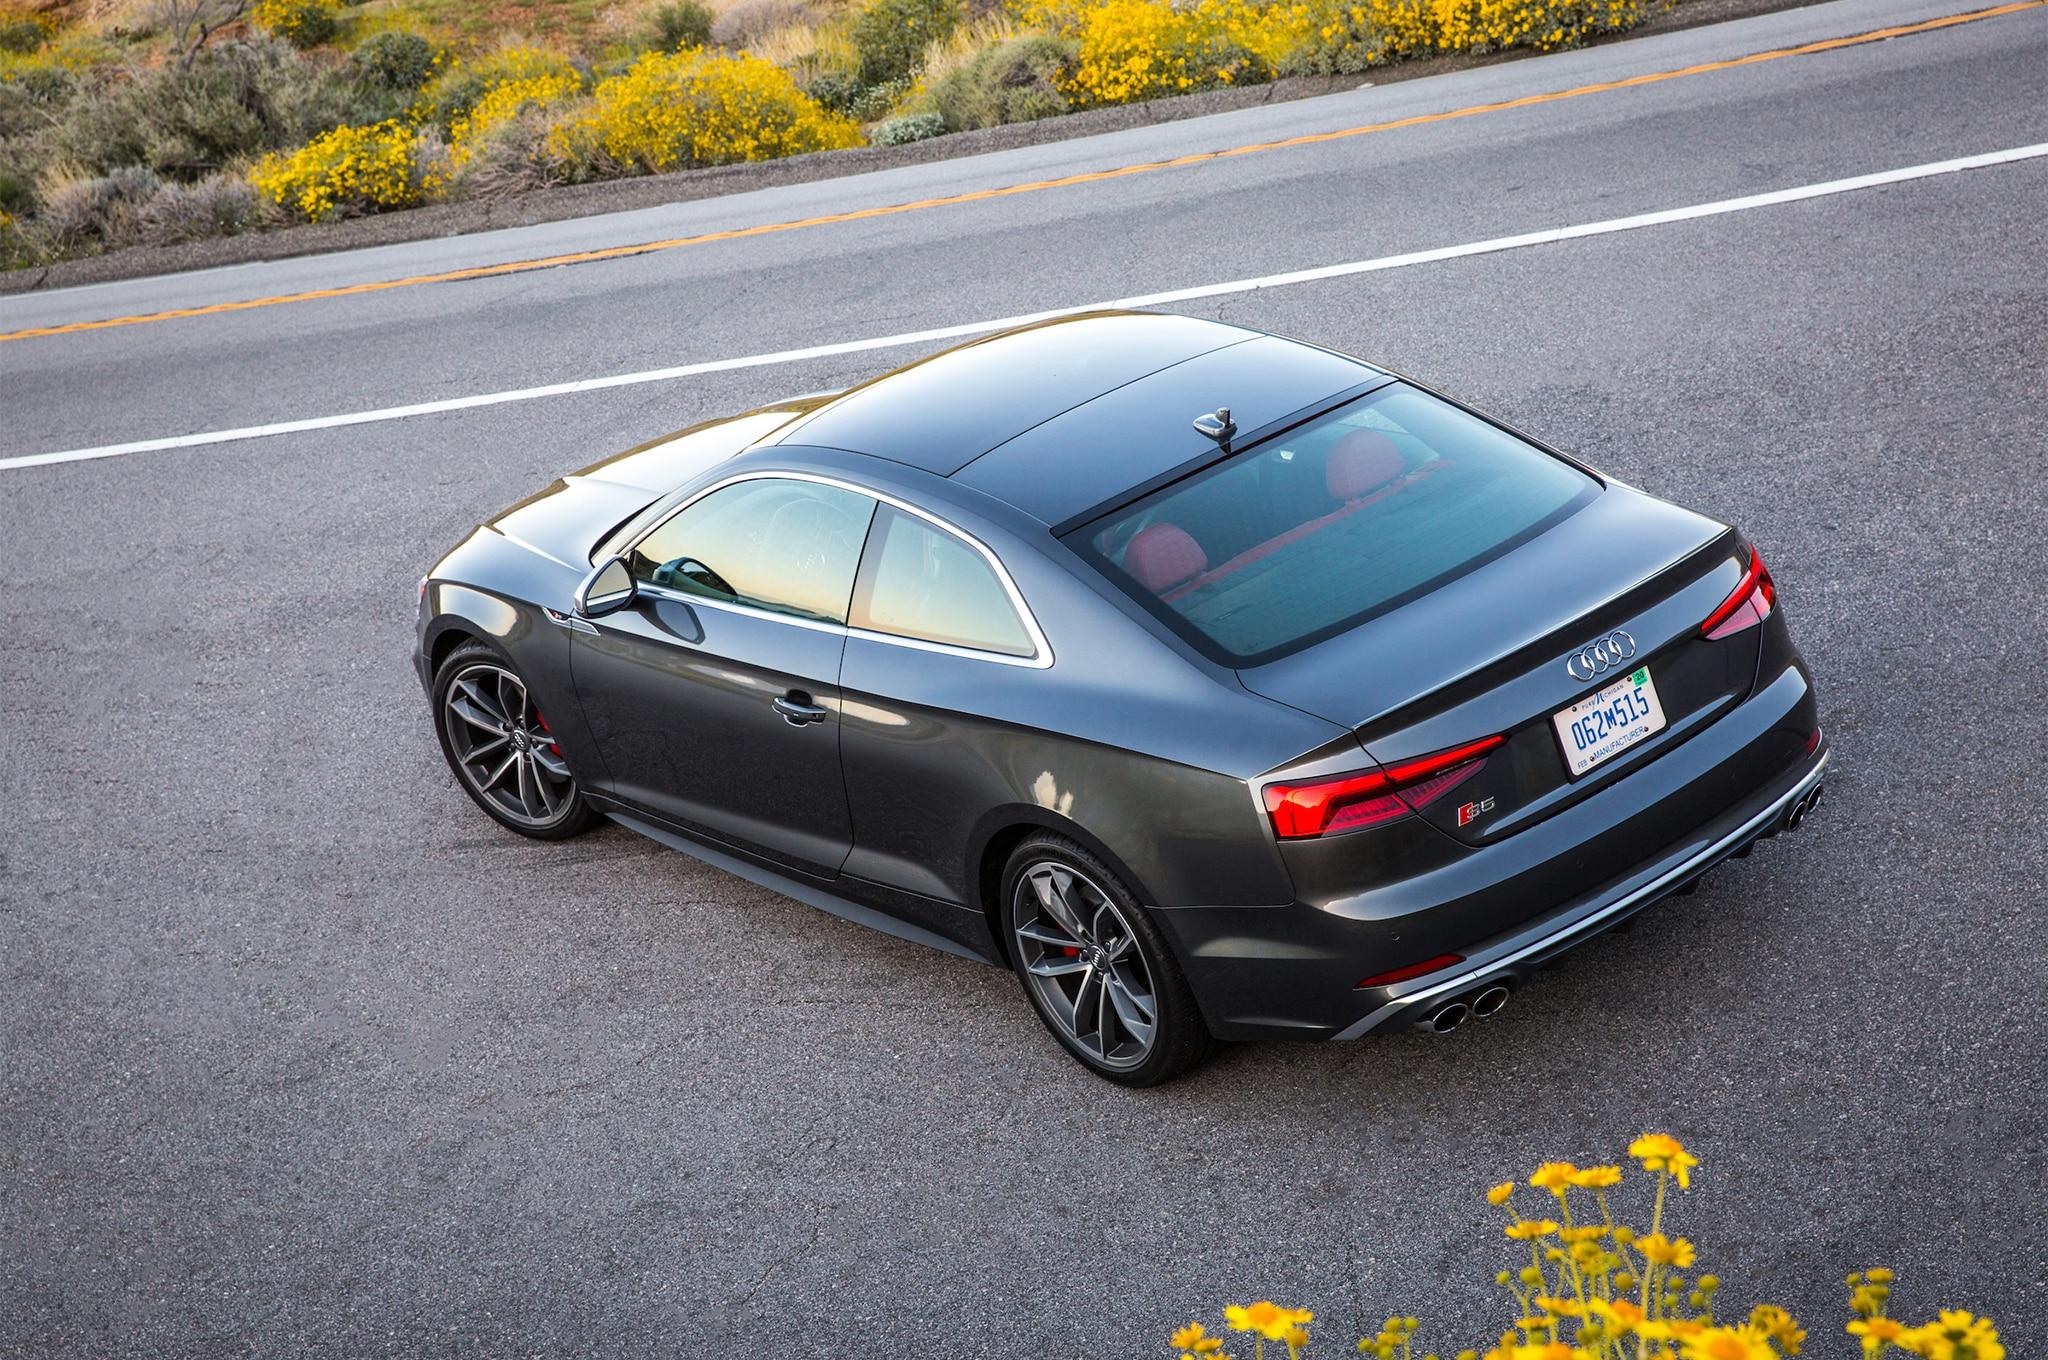 2018 Audi S5 Coupe  Price amp Specs  Audi USA